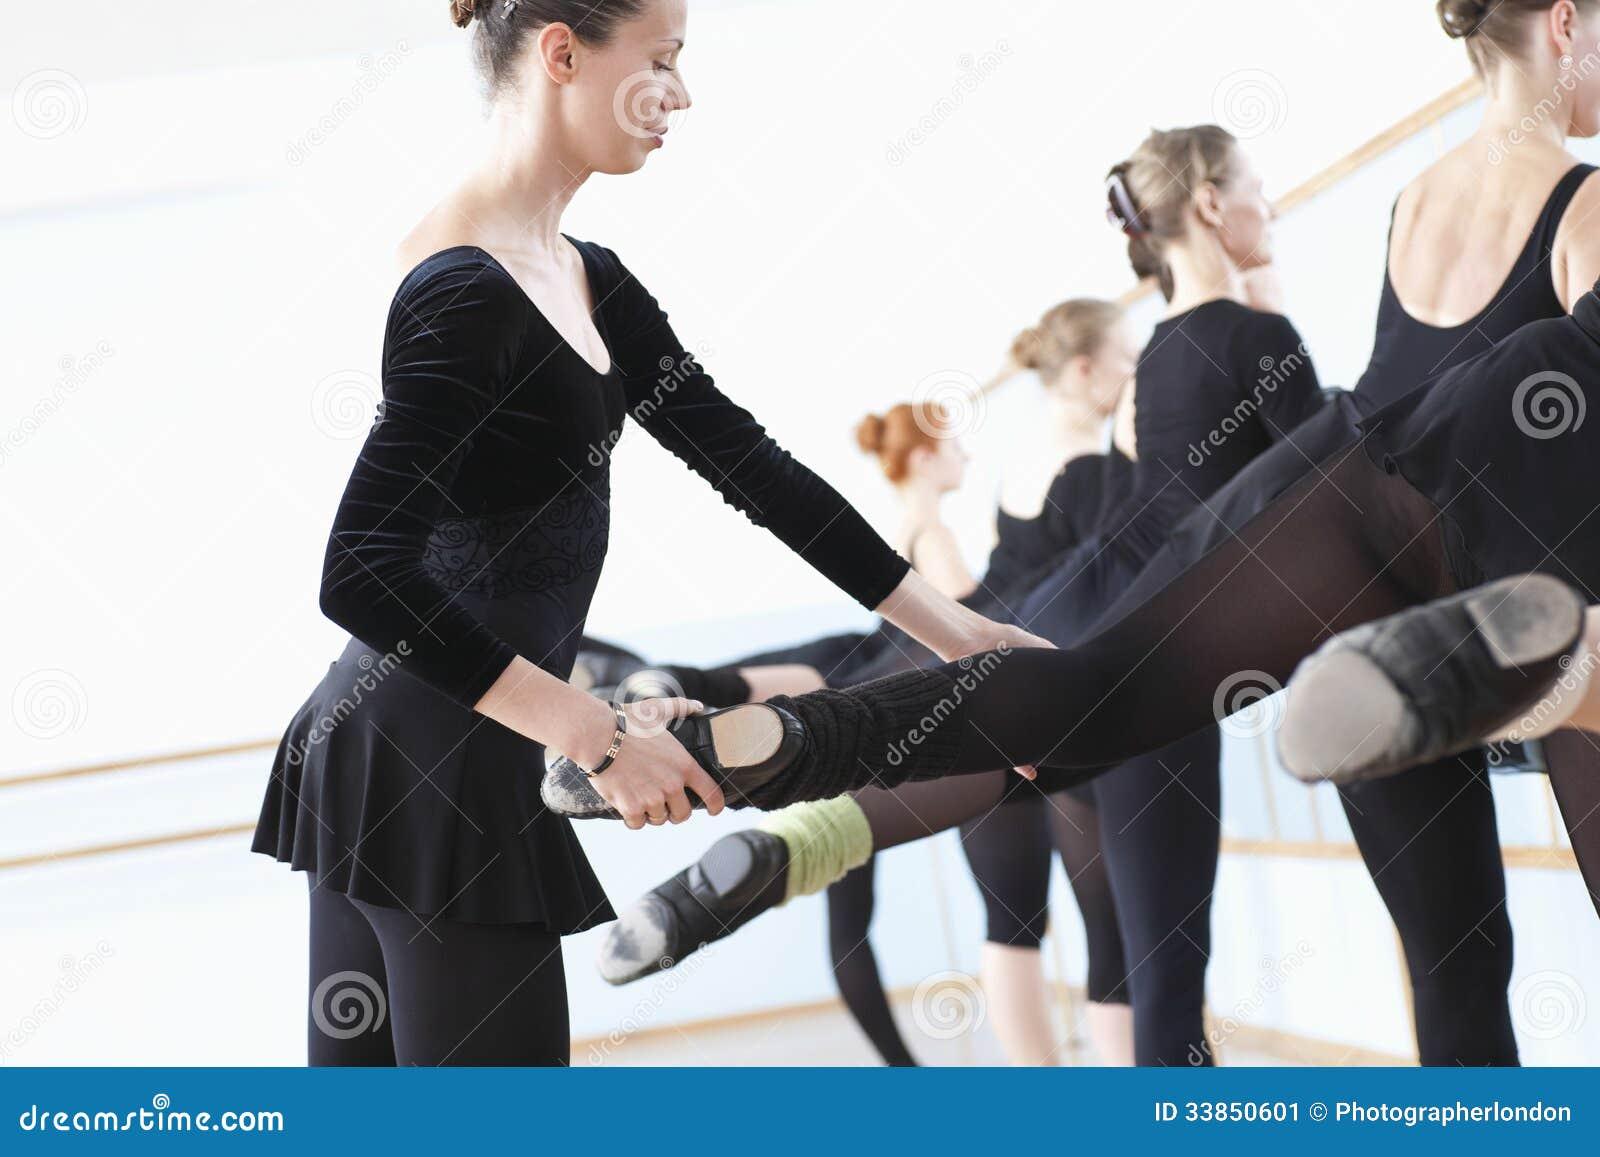 Ballet Teacher Adjusting Foot Positions Of Ballerinas